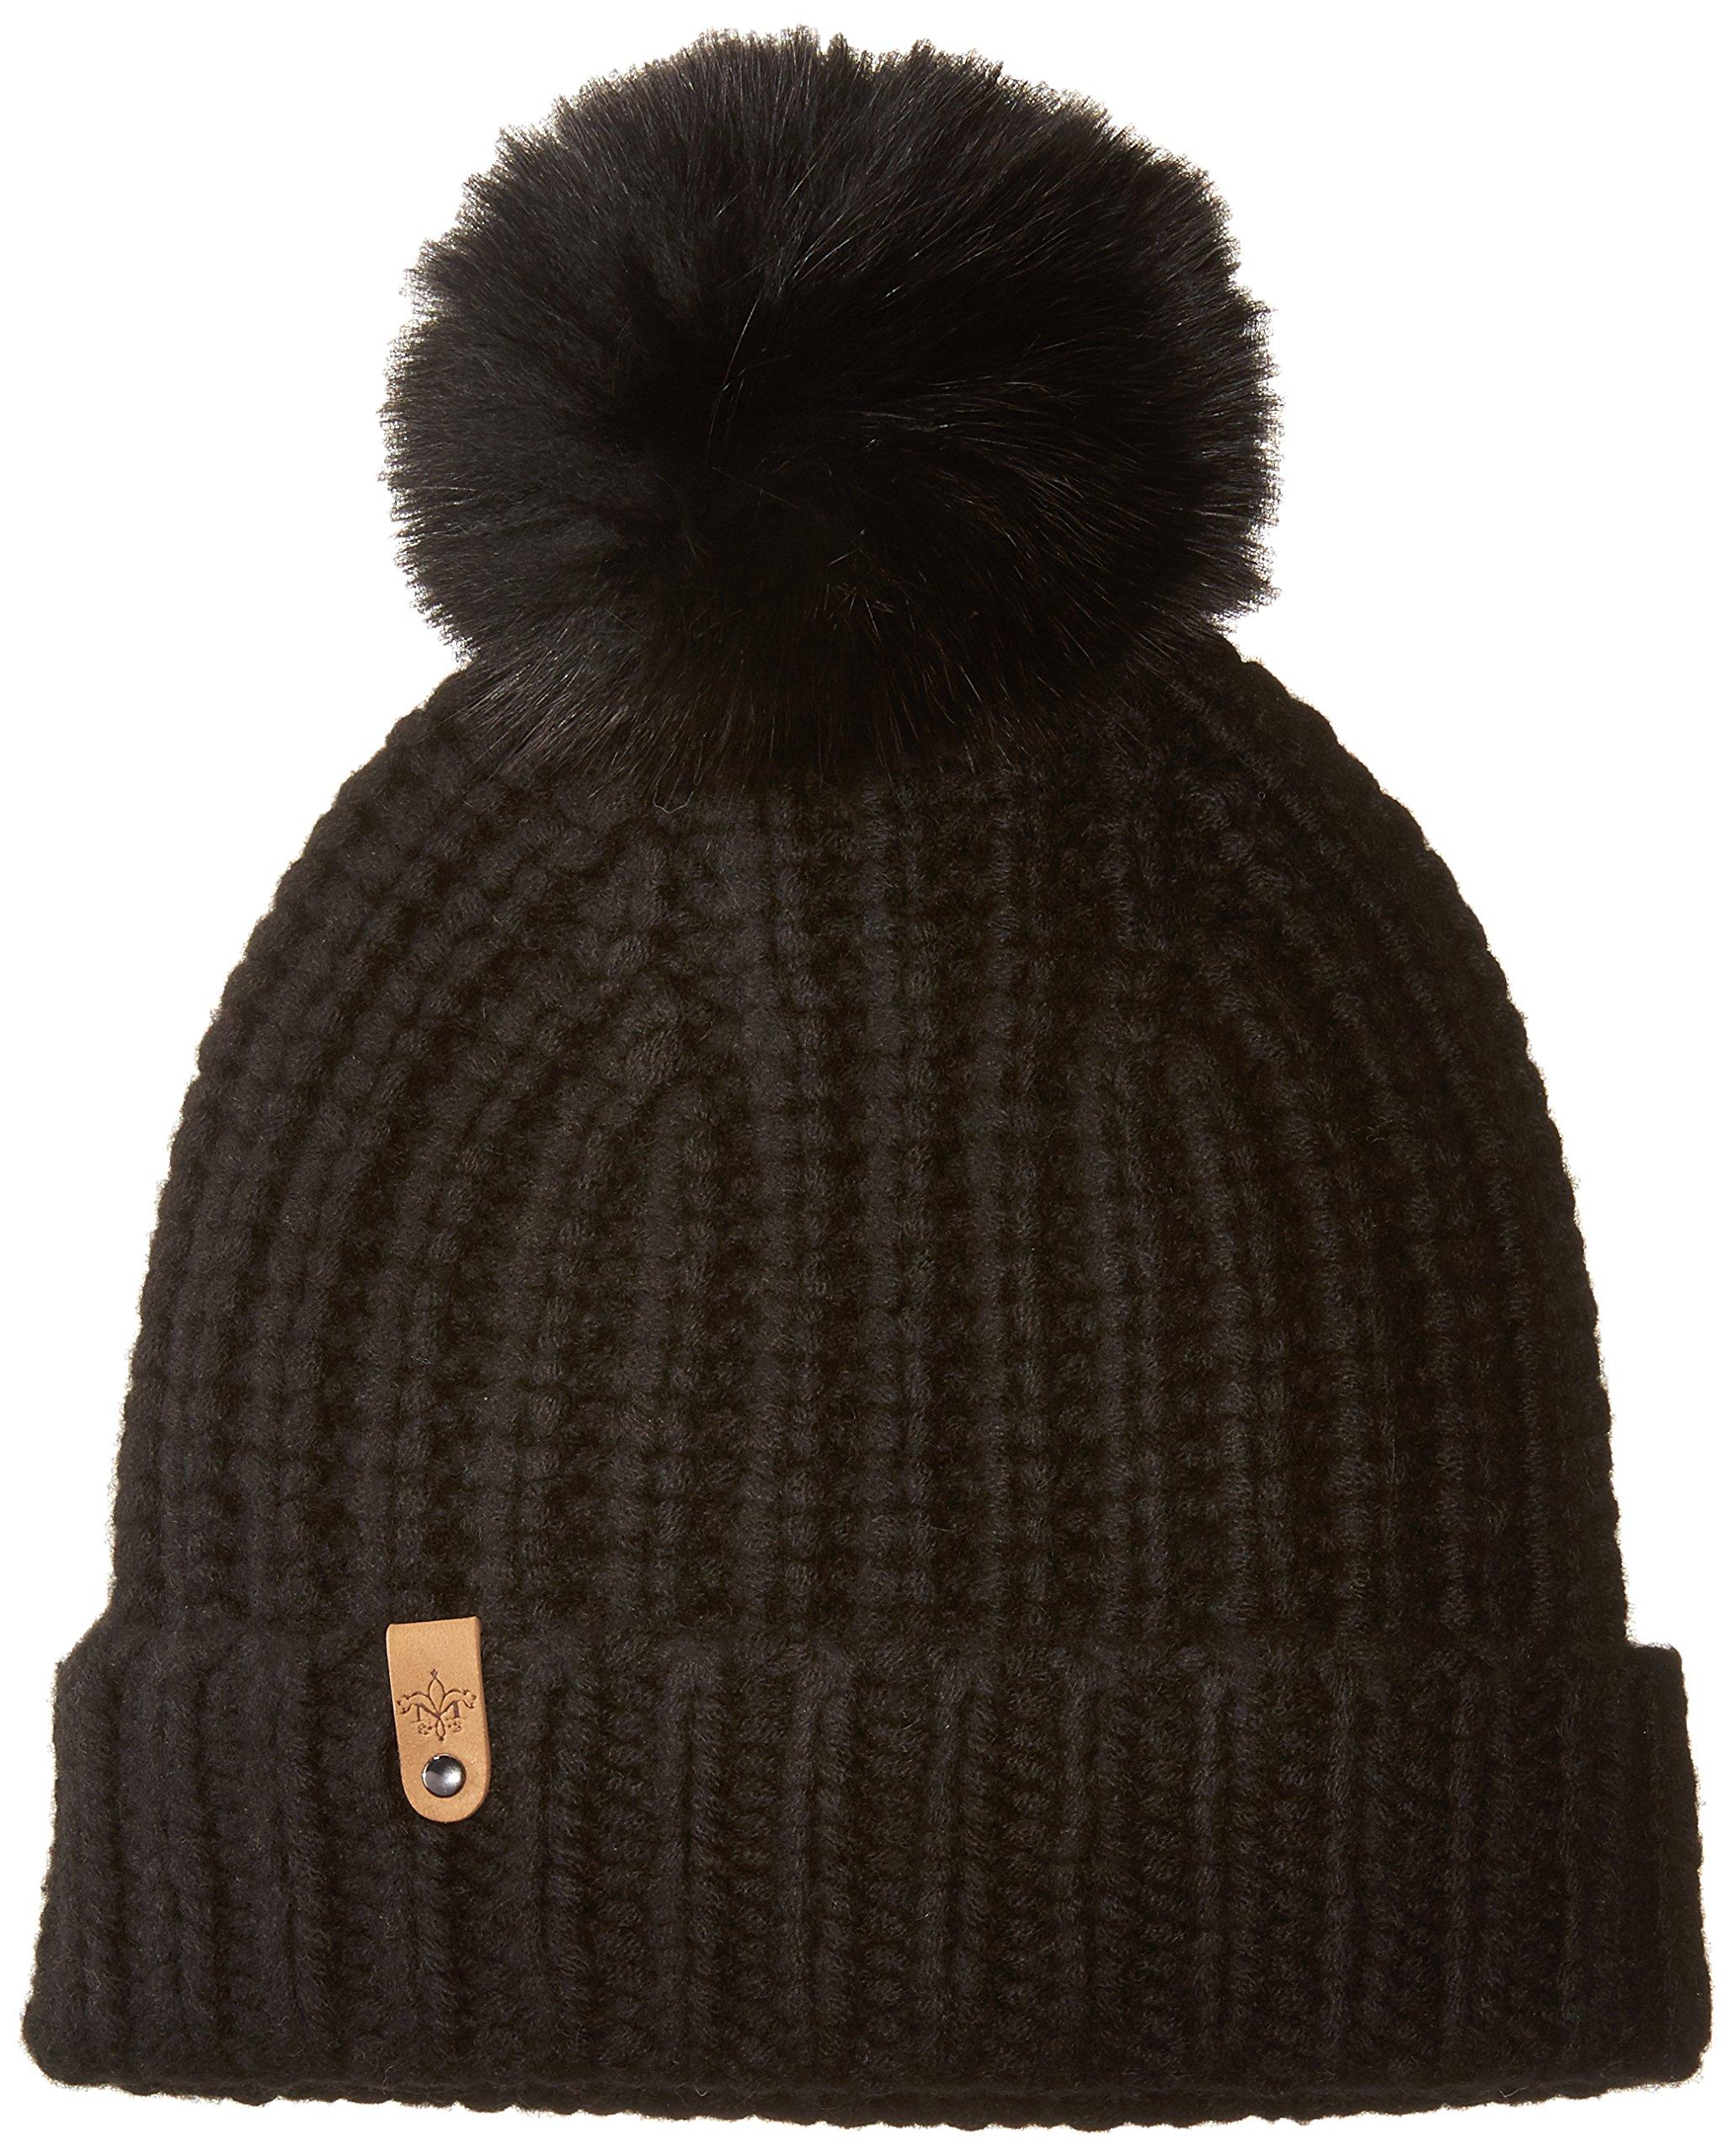 Mackage Women's Dori Beanie, Black, One Size by Mackage